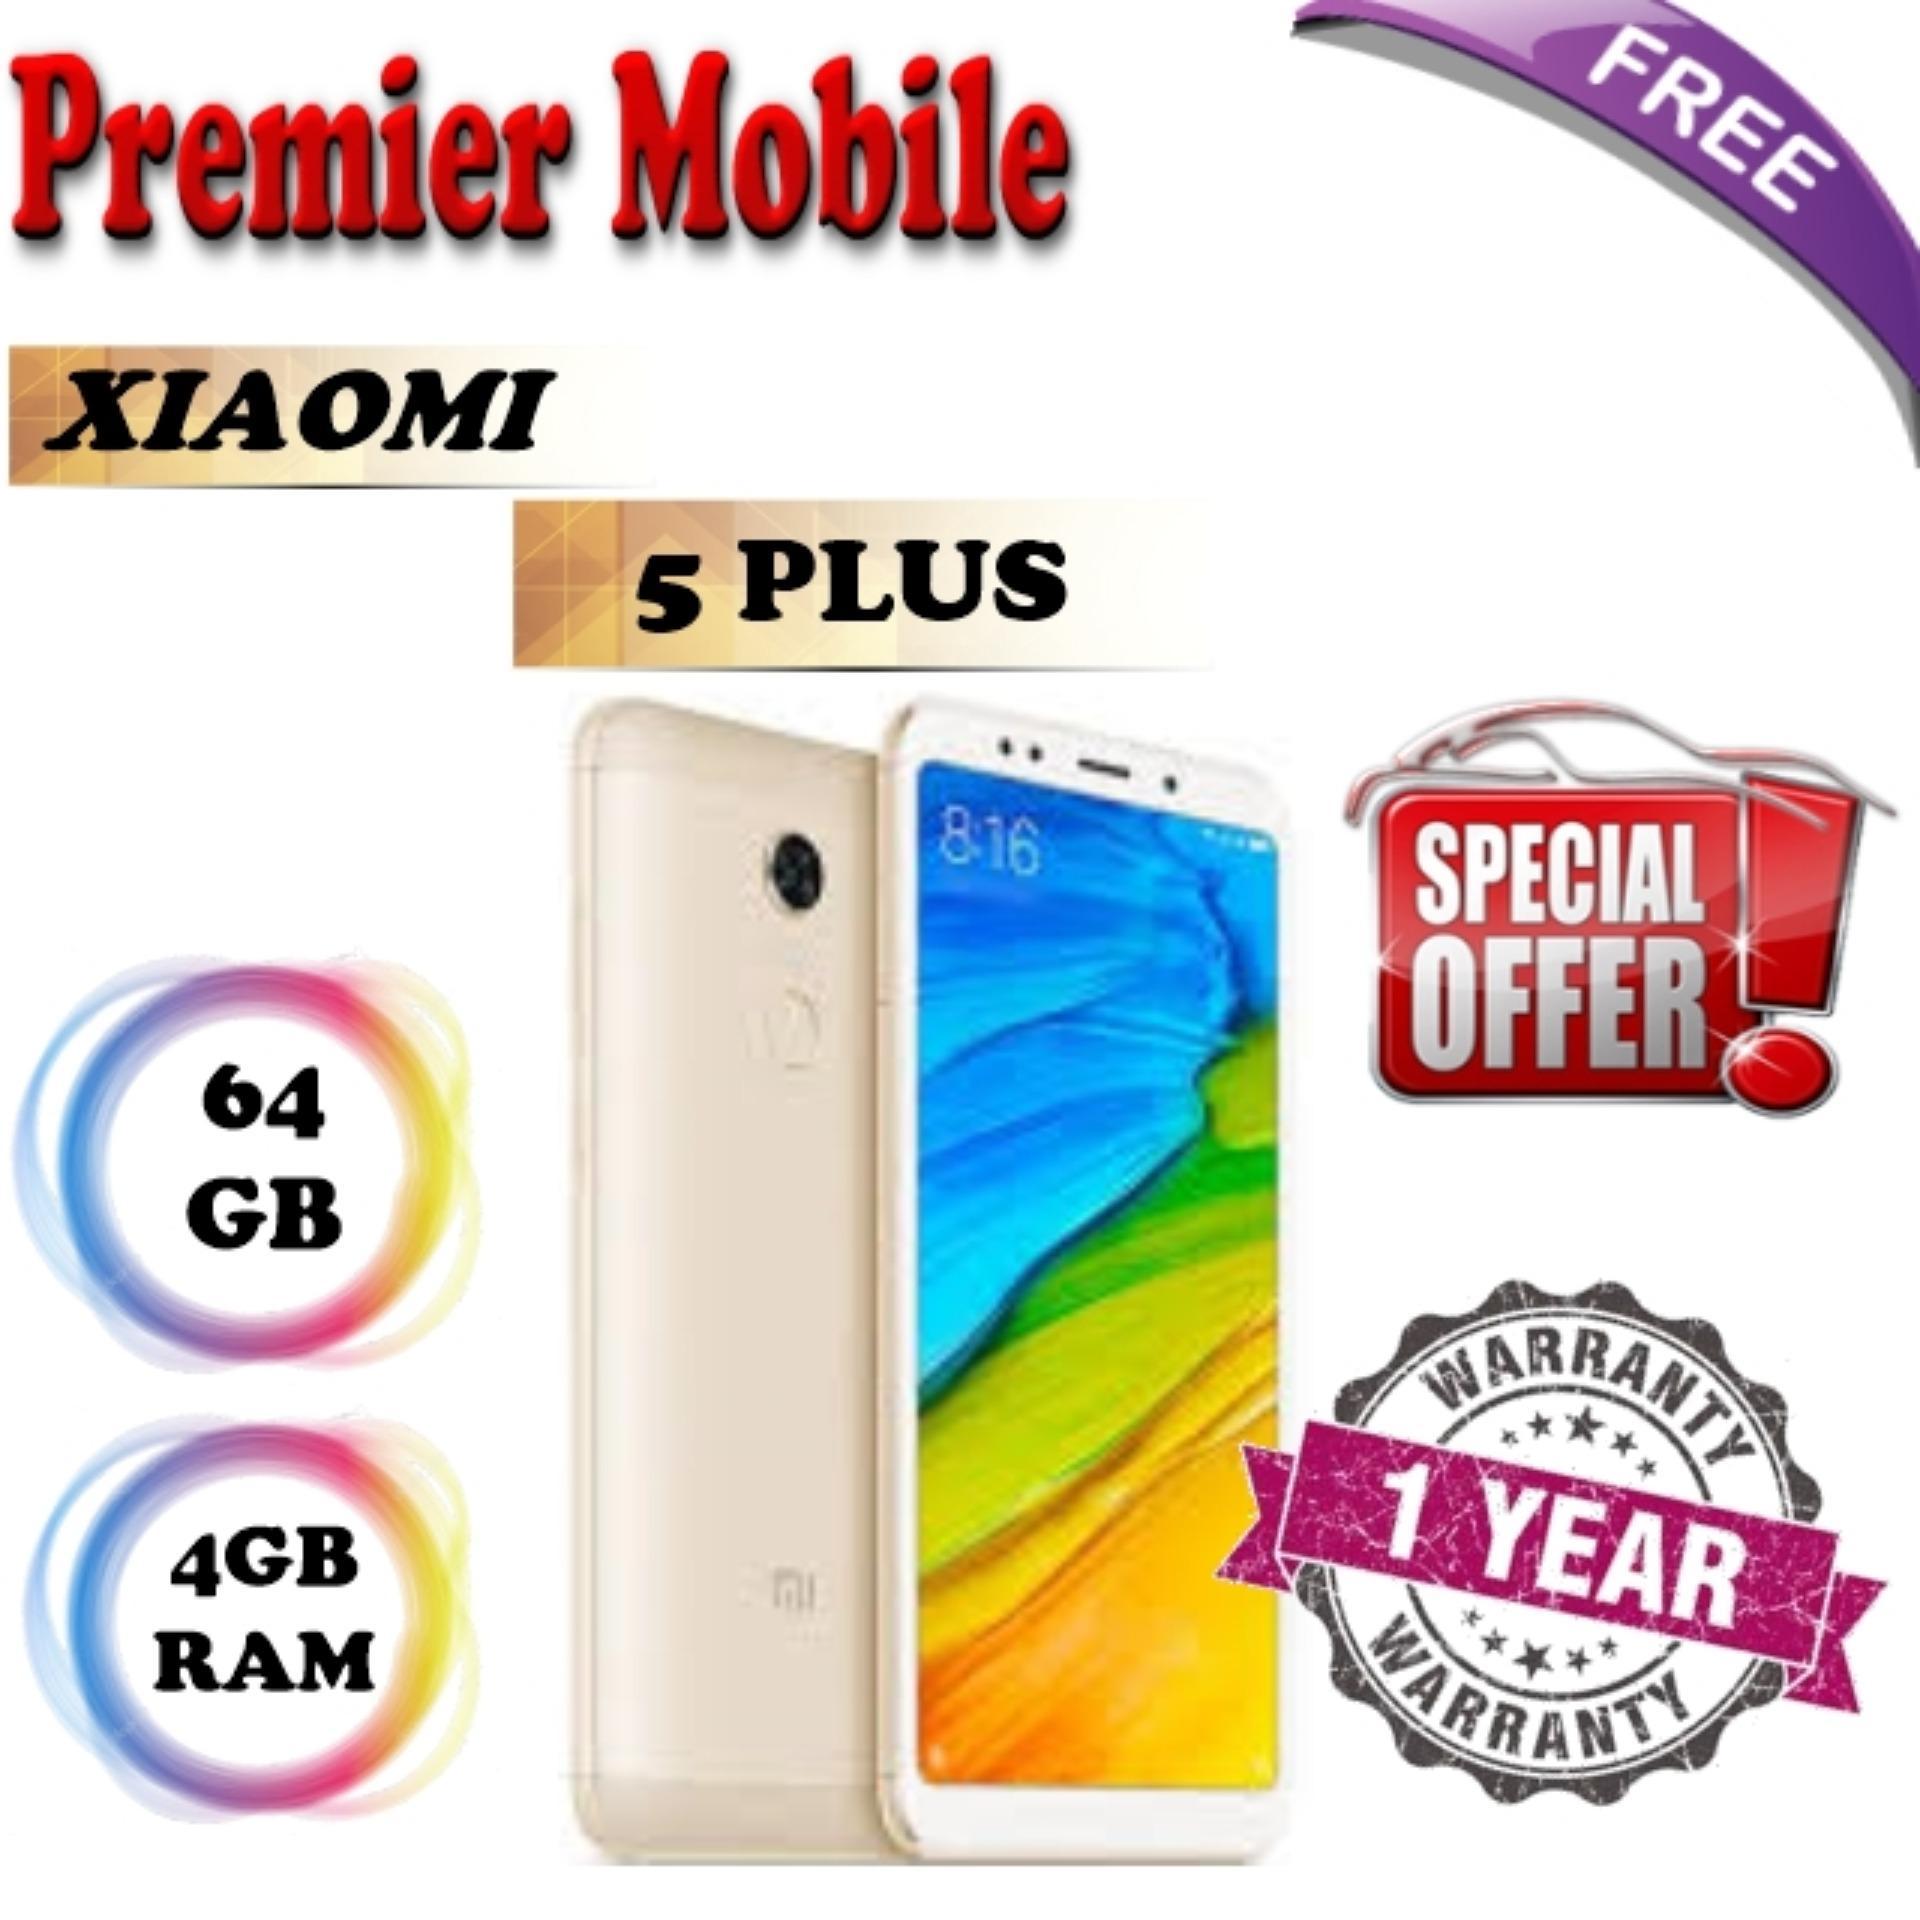 Xiaomi Redmi 5 Plus 64GB (Local)